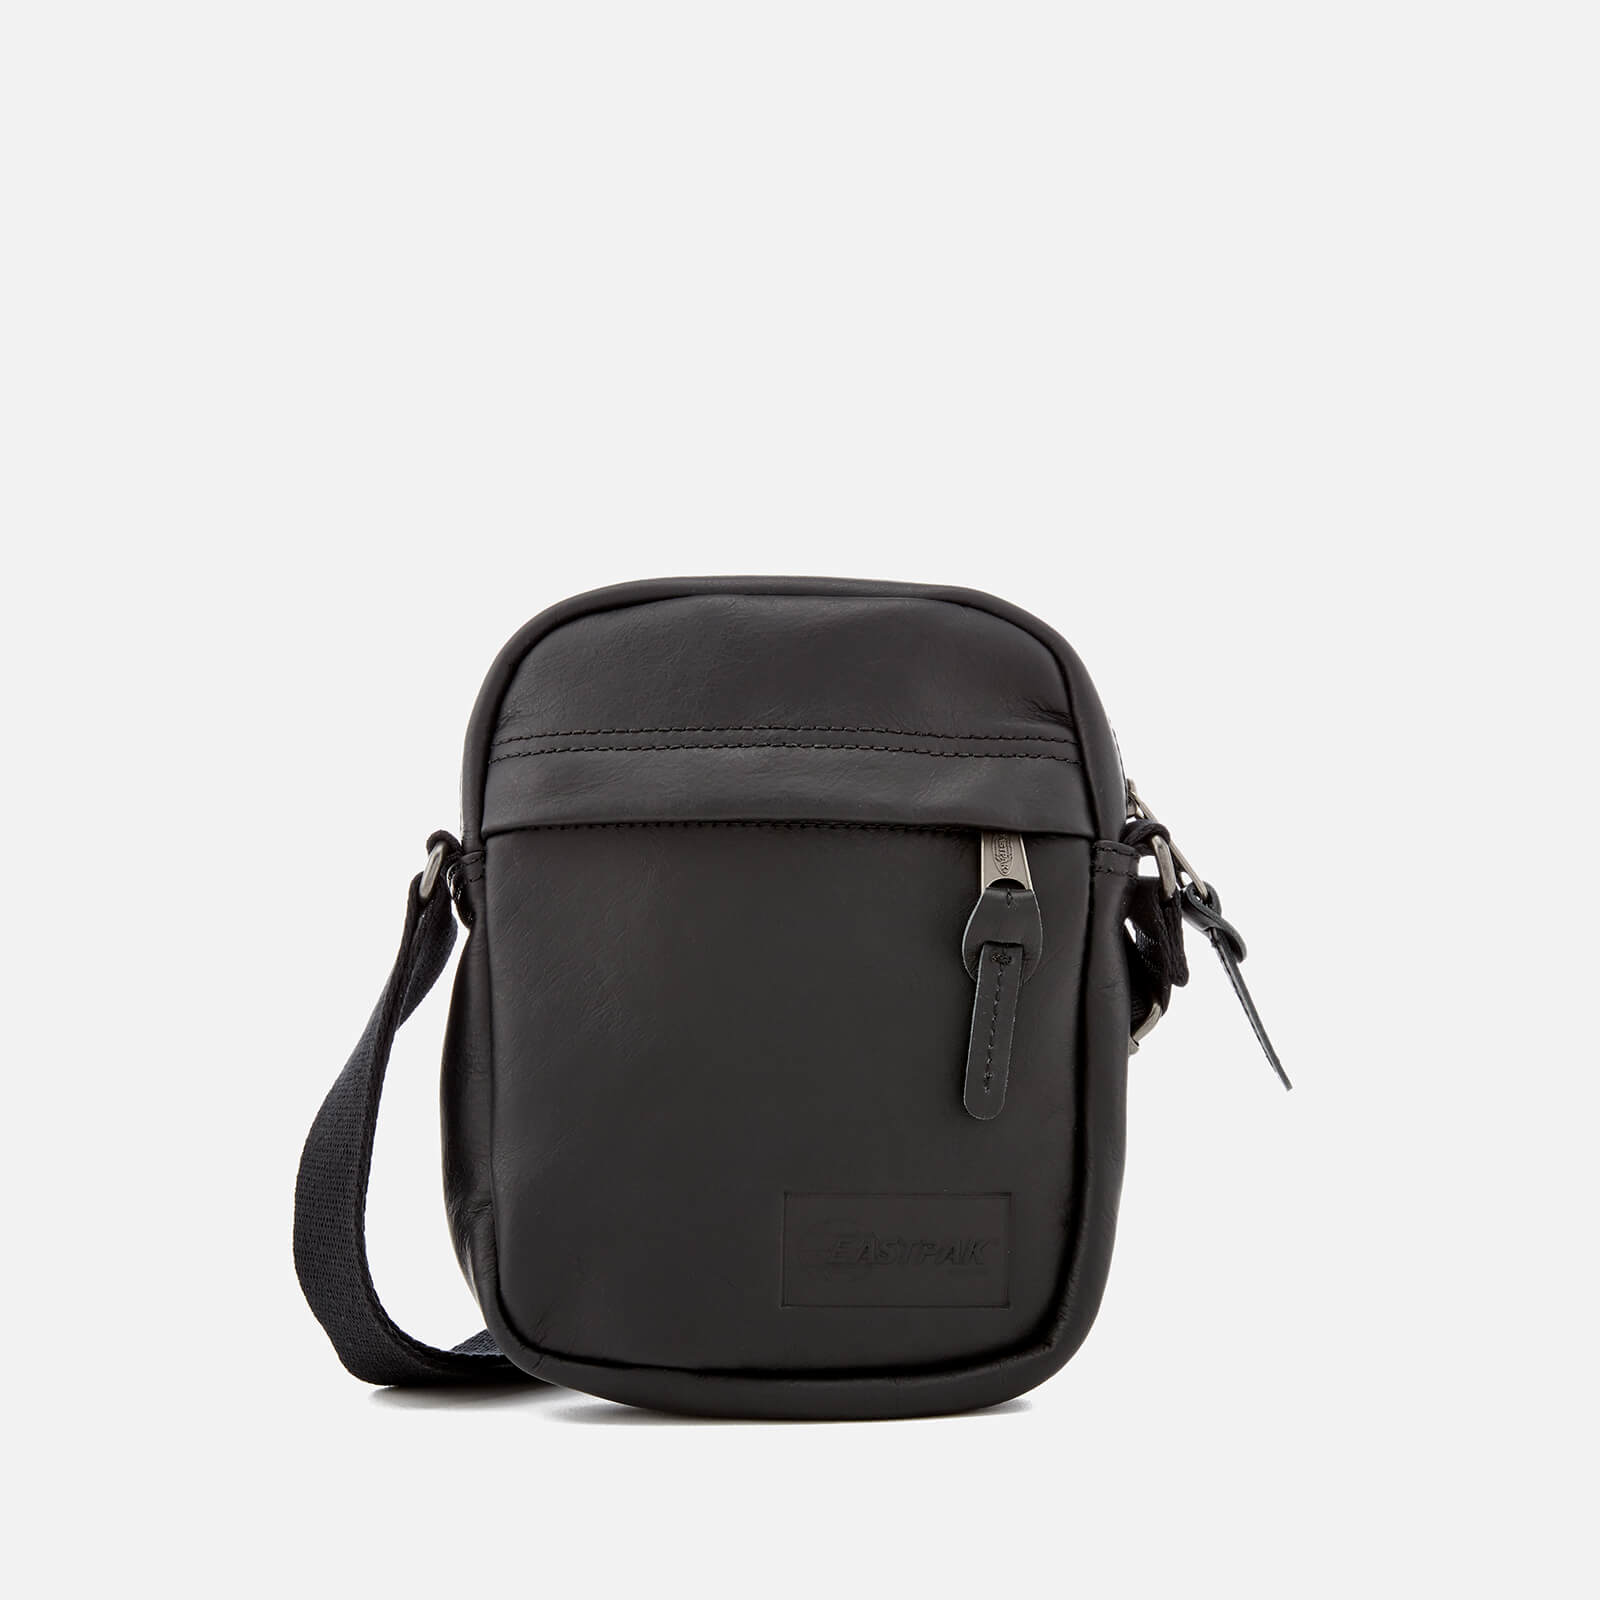 354a035b Eastpak Men's The One Leather Cross Body Bag - Black